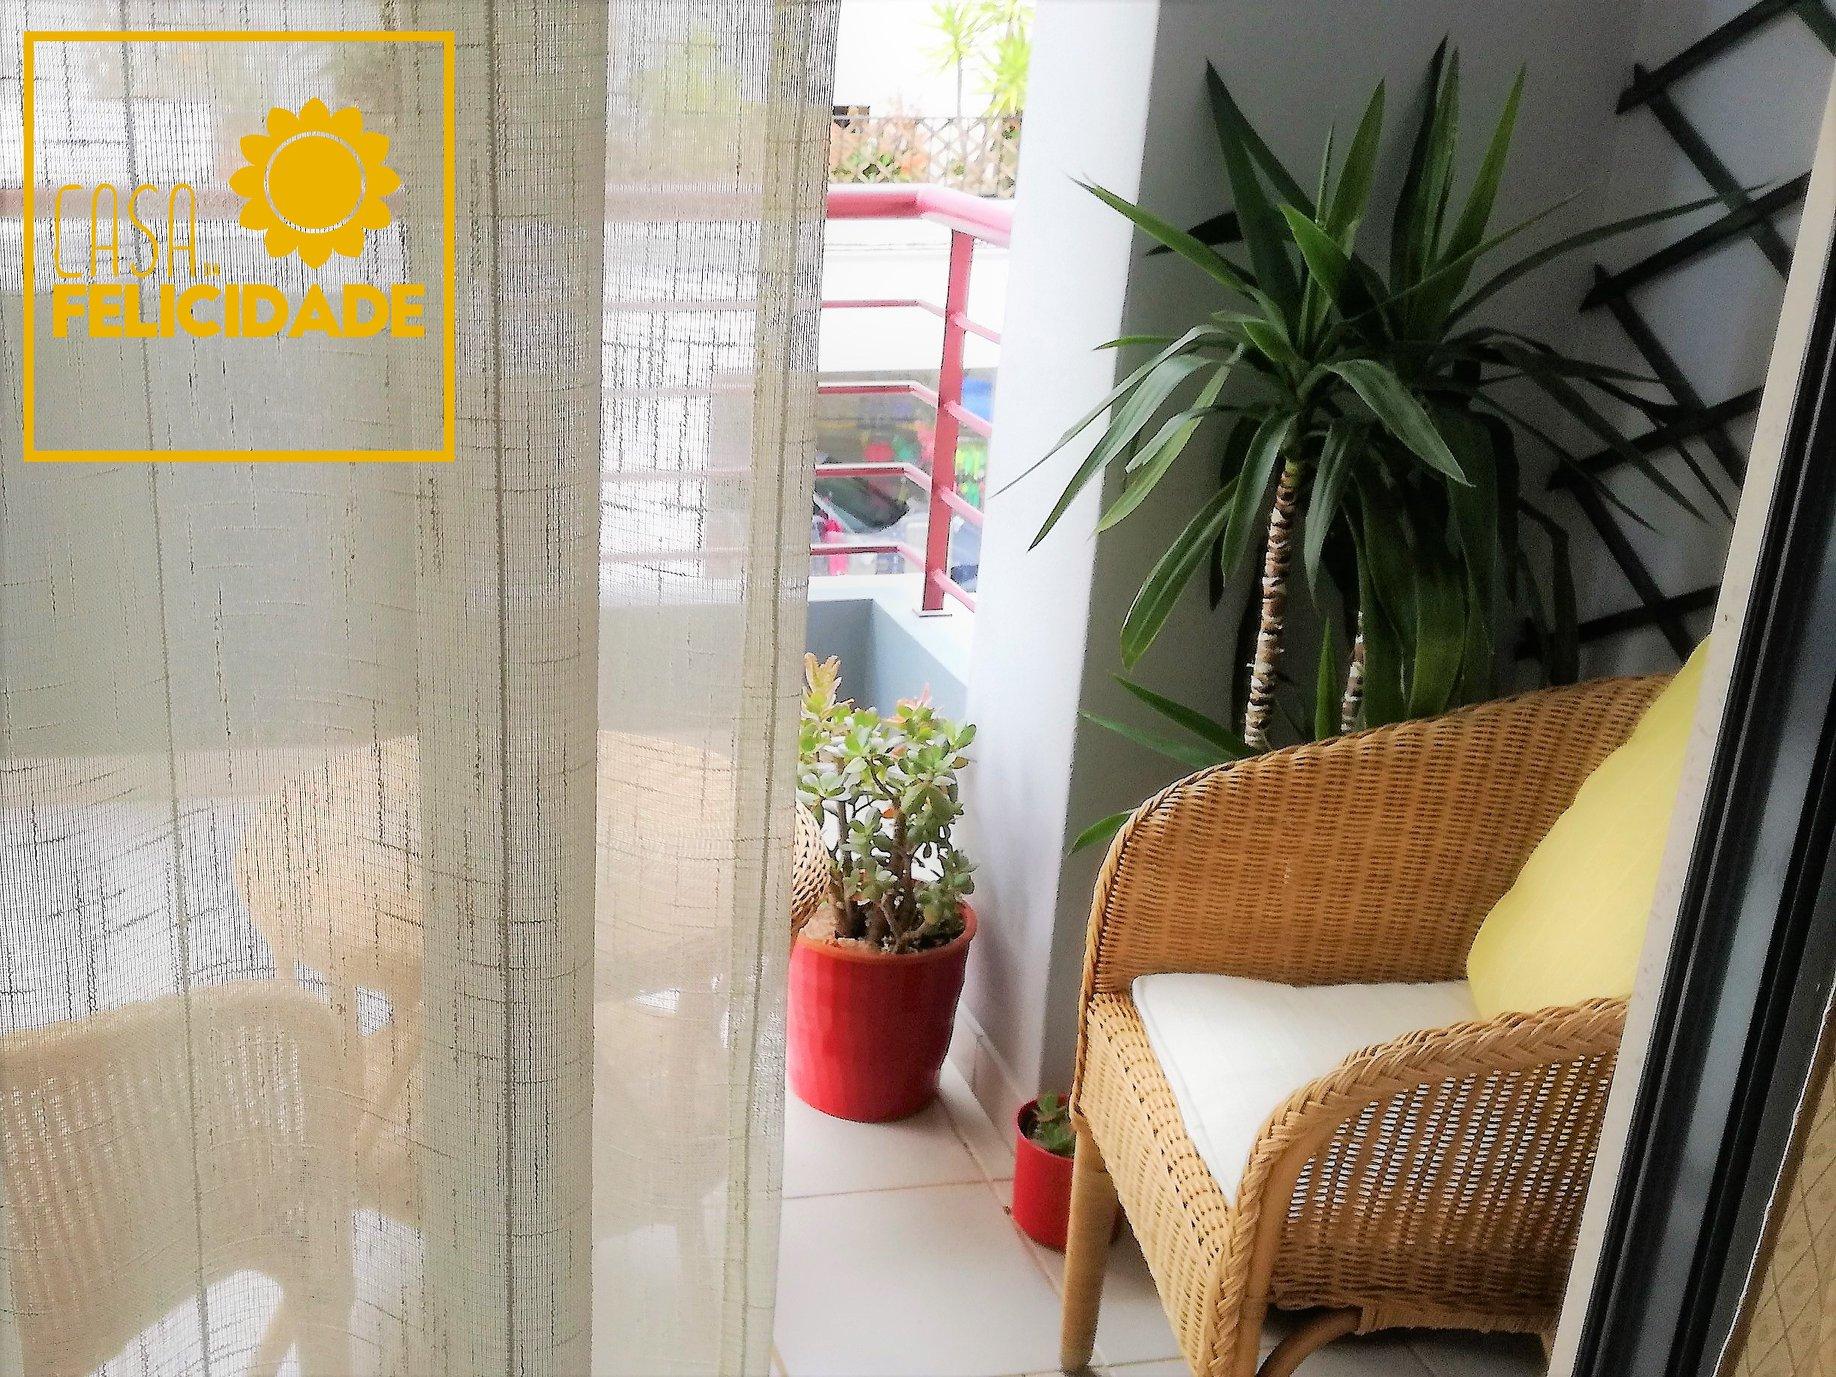 Holiday apartments and villas for rent, Casa da Felicidade – Vacation Rental Apartment in Lagos, Portugal Algarve, REF_IMG_4629_4651